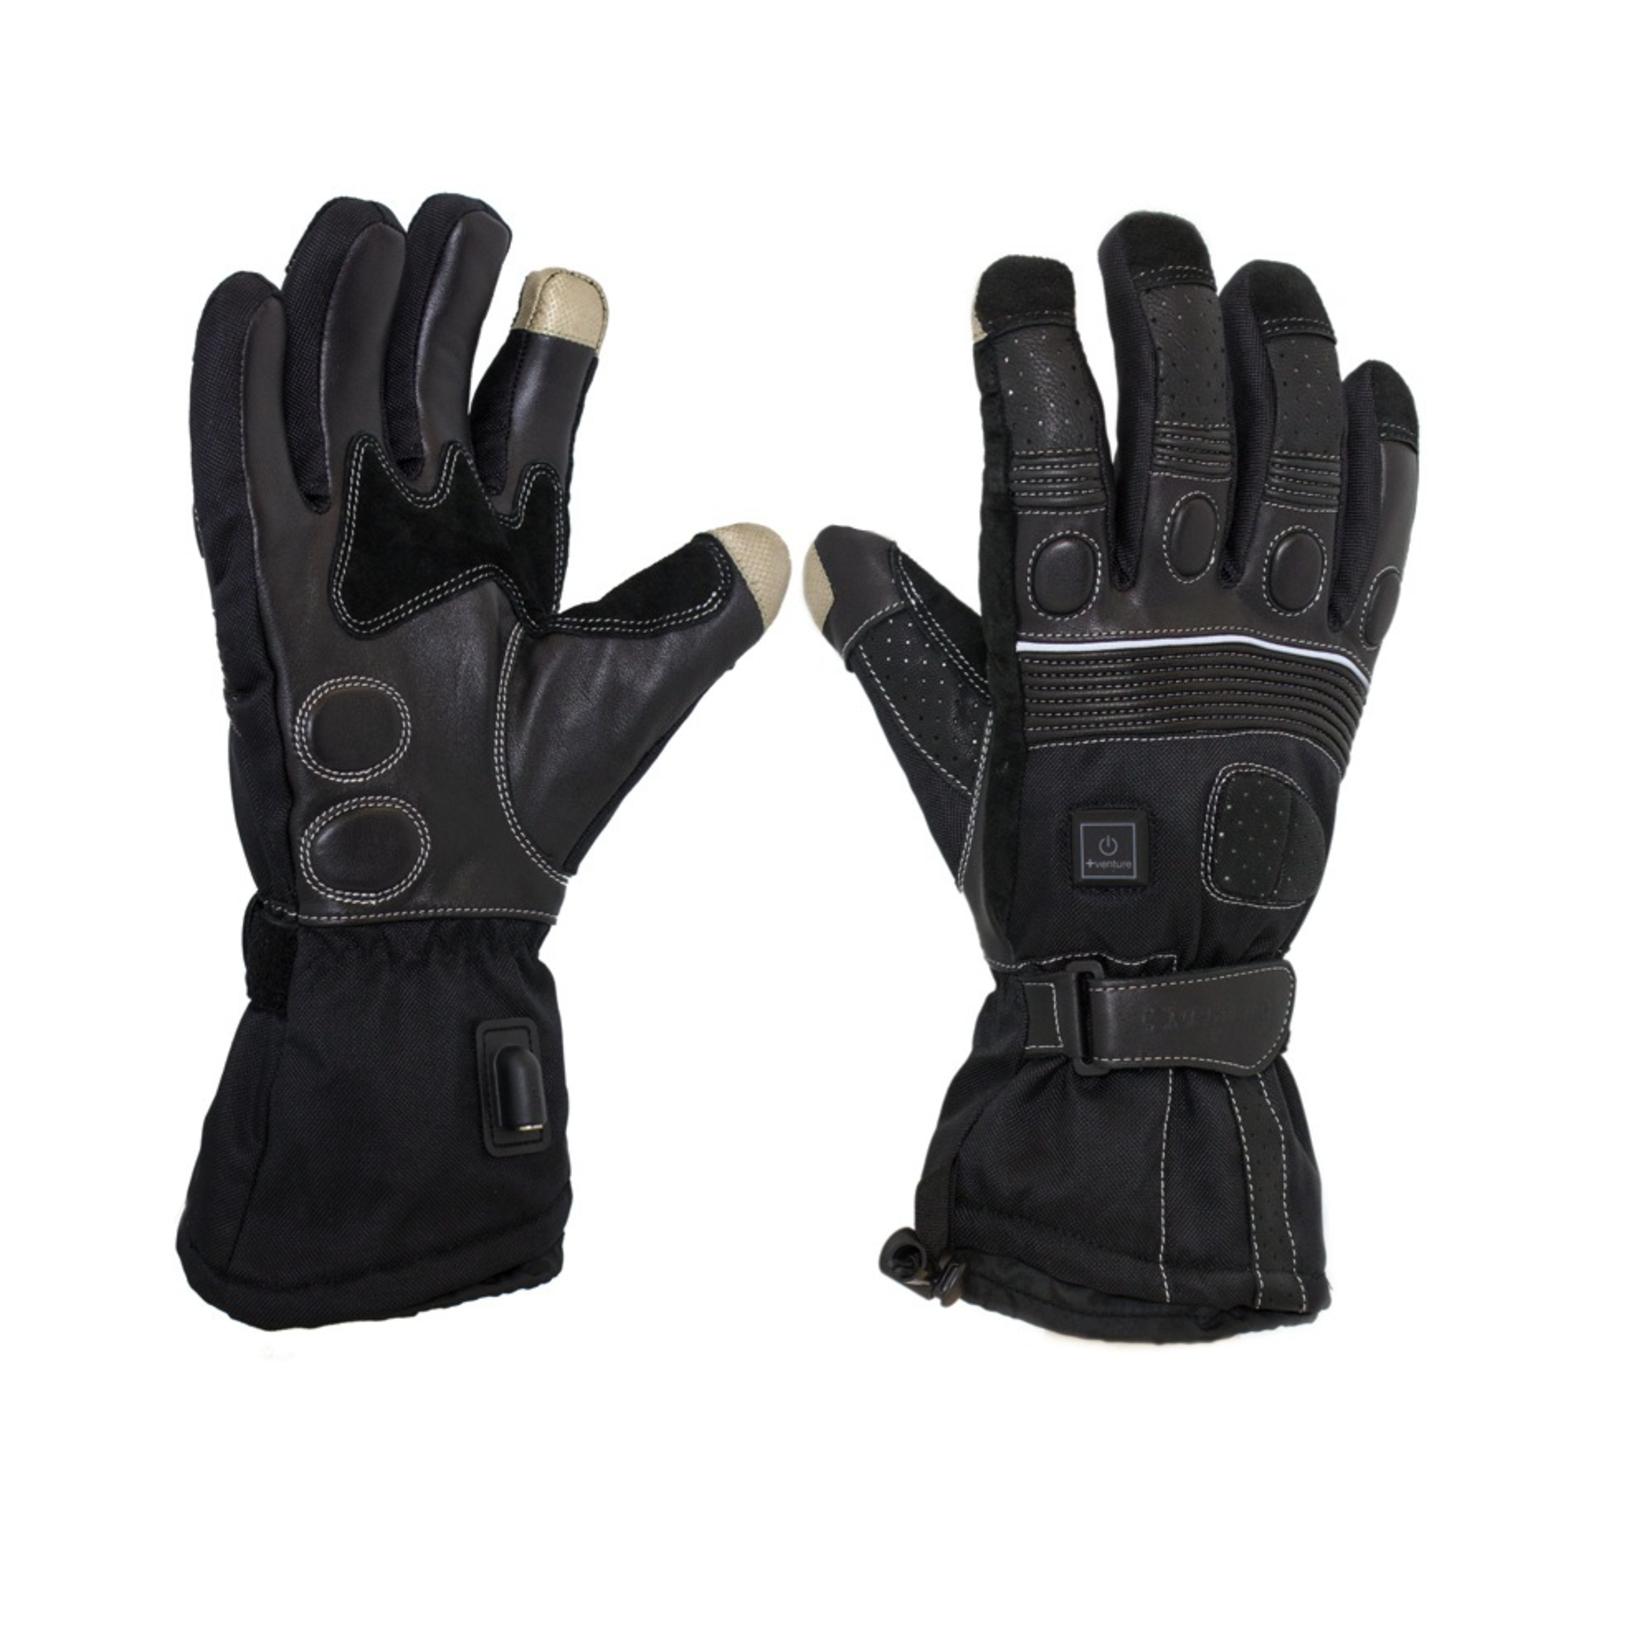 Apparel Gloves, Venture+ Heated Temp-Control (Non battery)